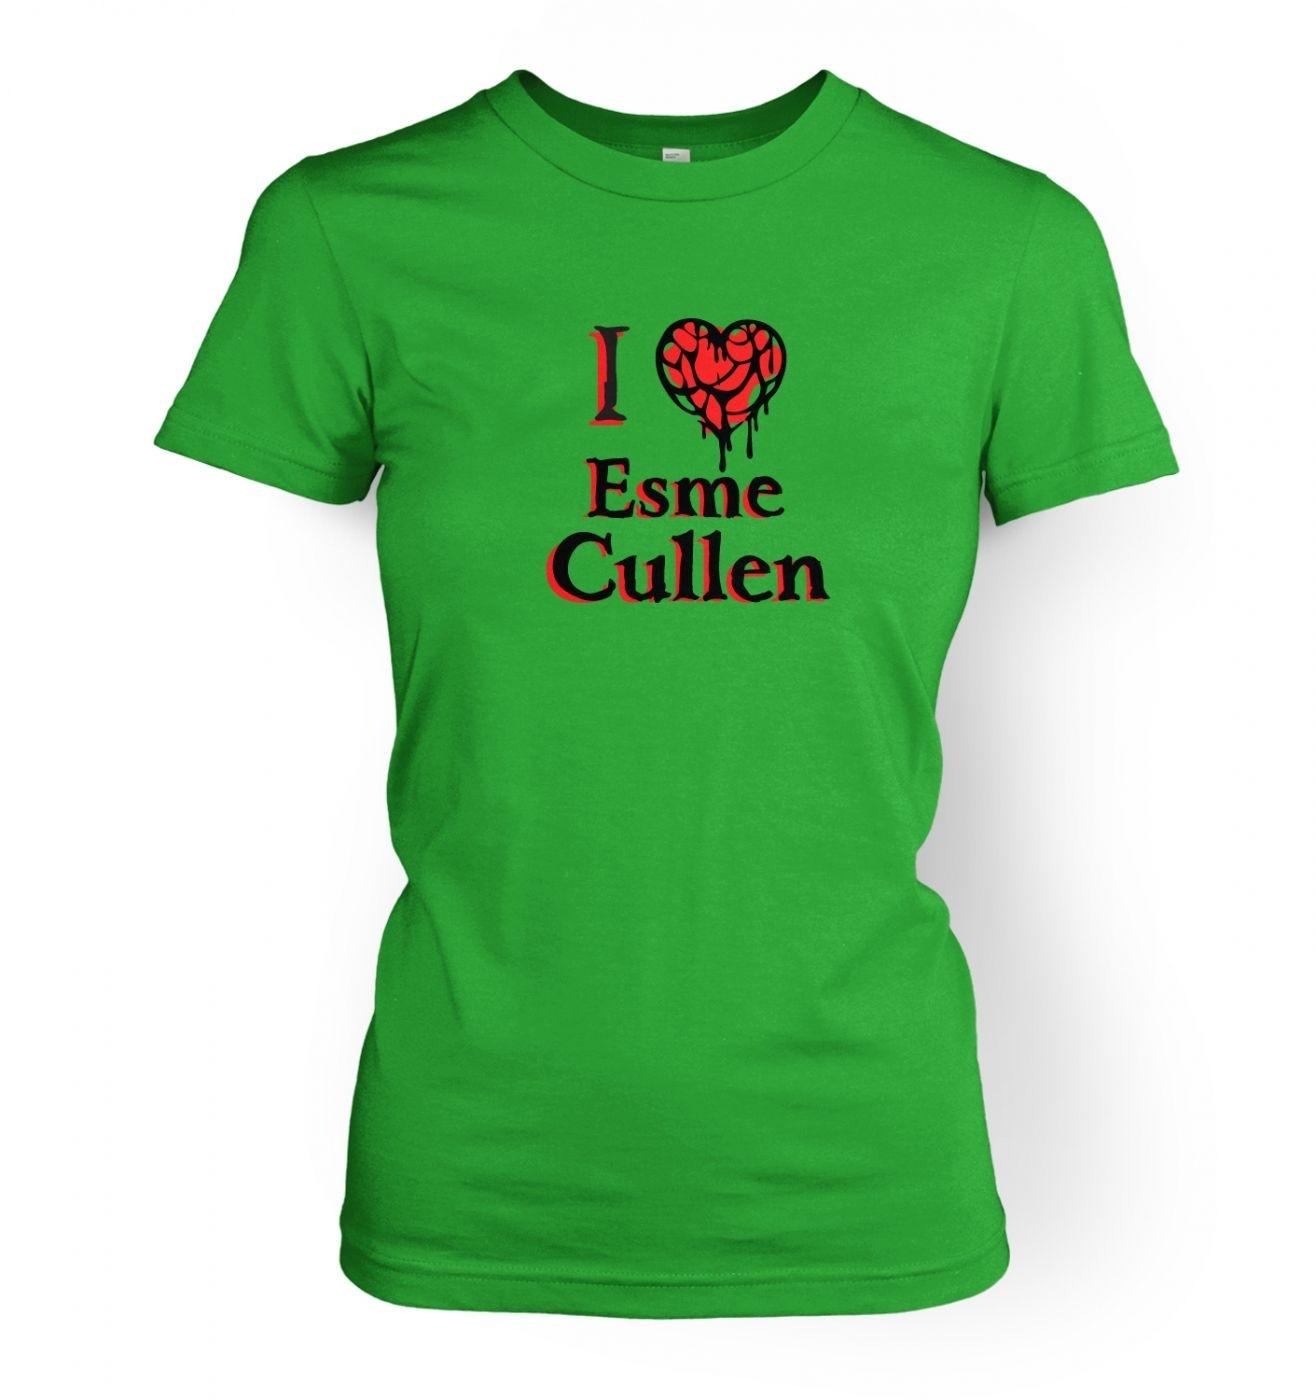 I heart Esme Cullen women's fitted t-shirt